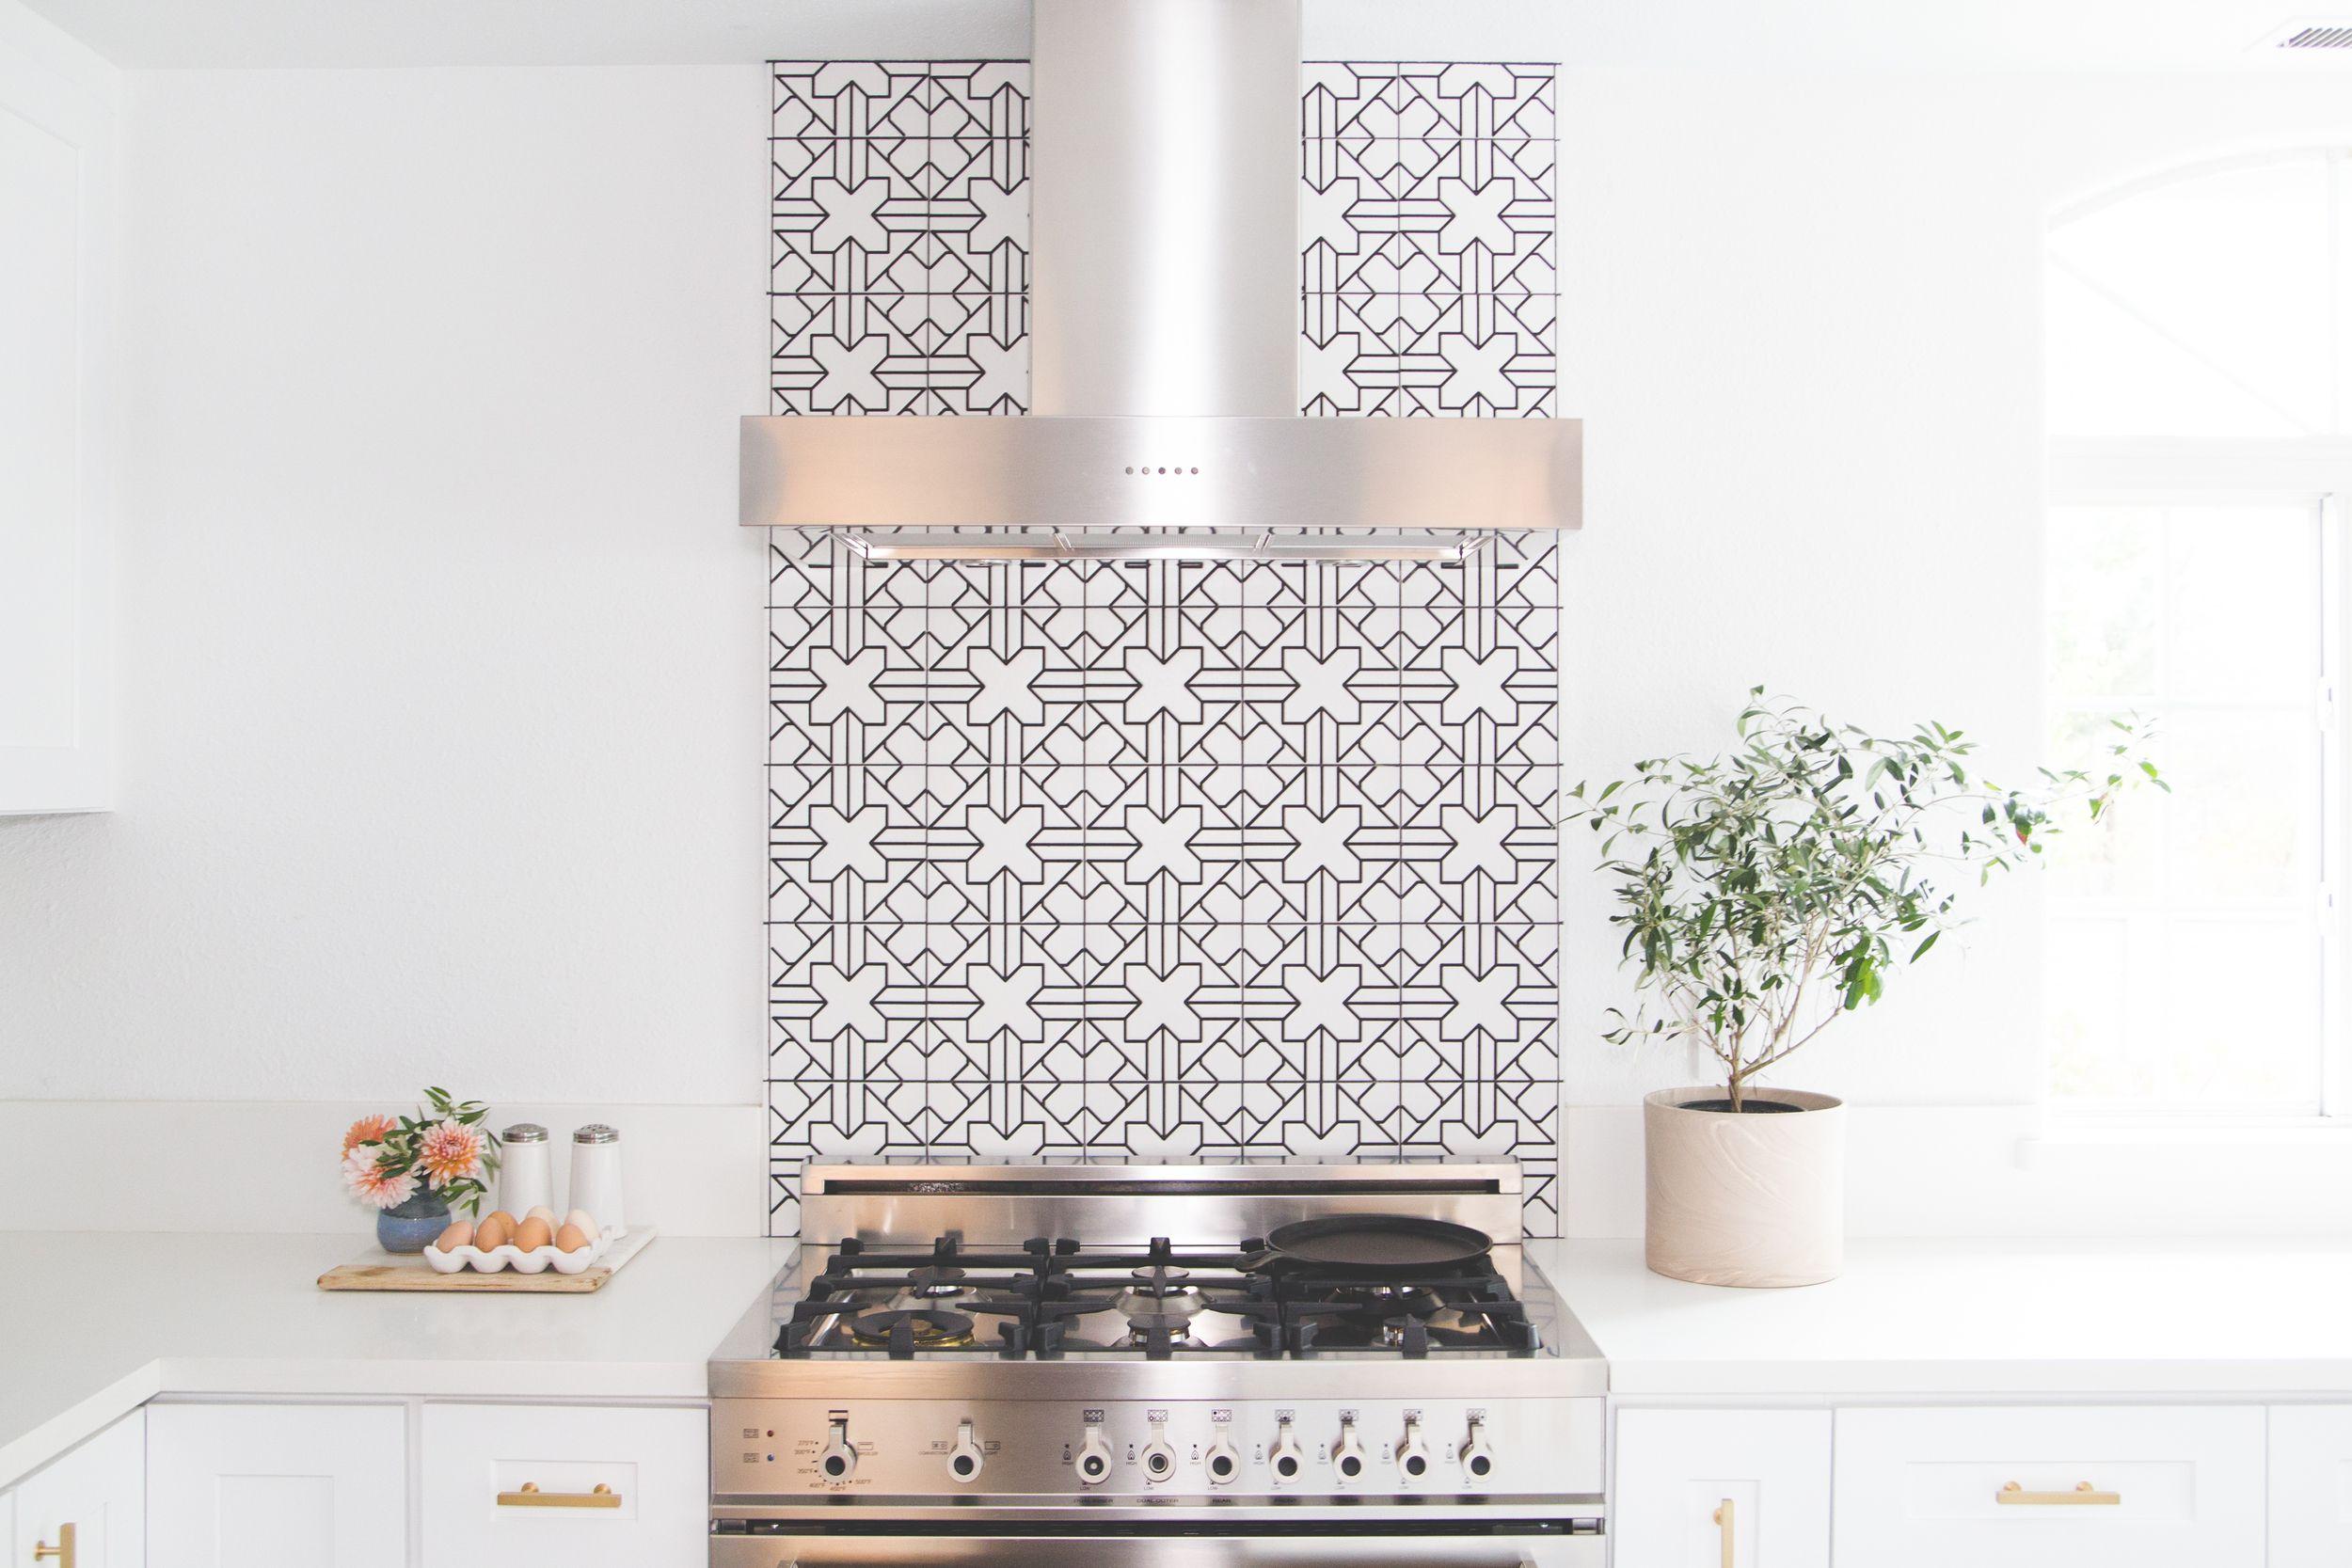 Unusual Kitchen Tiles Design Inspiration Architecture Interior Rh  Gpixelbook Com